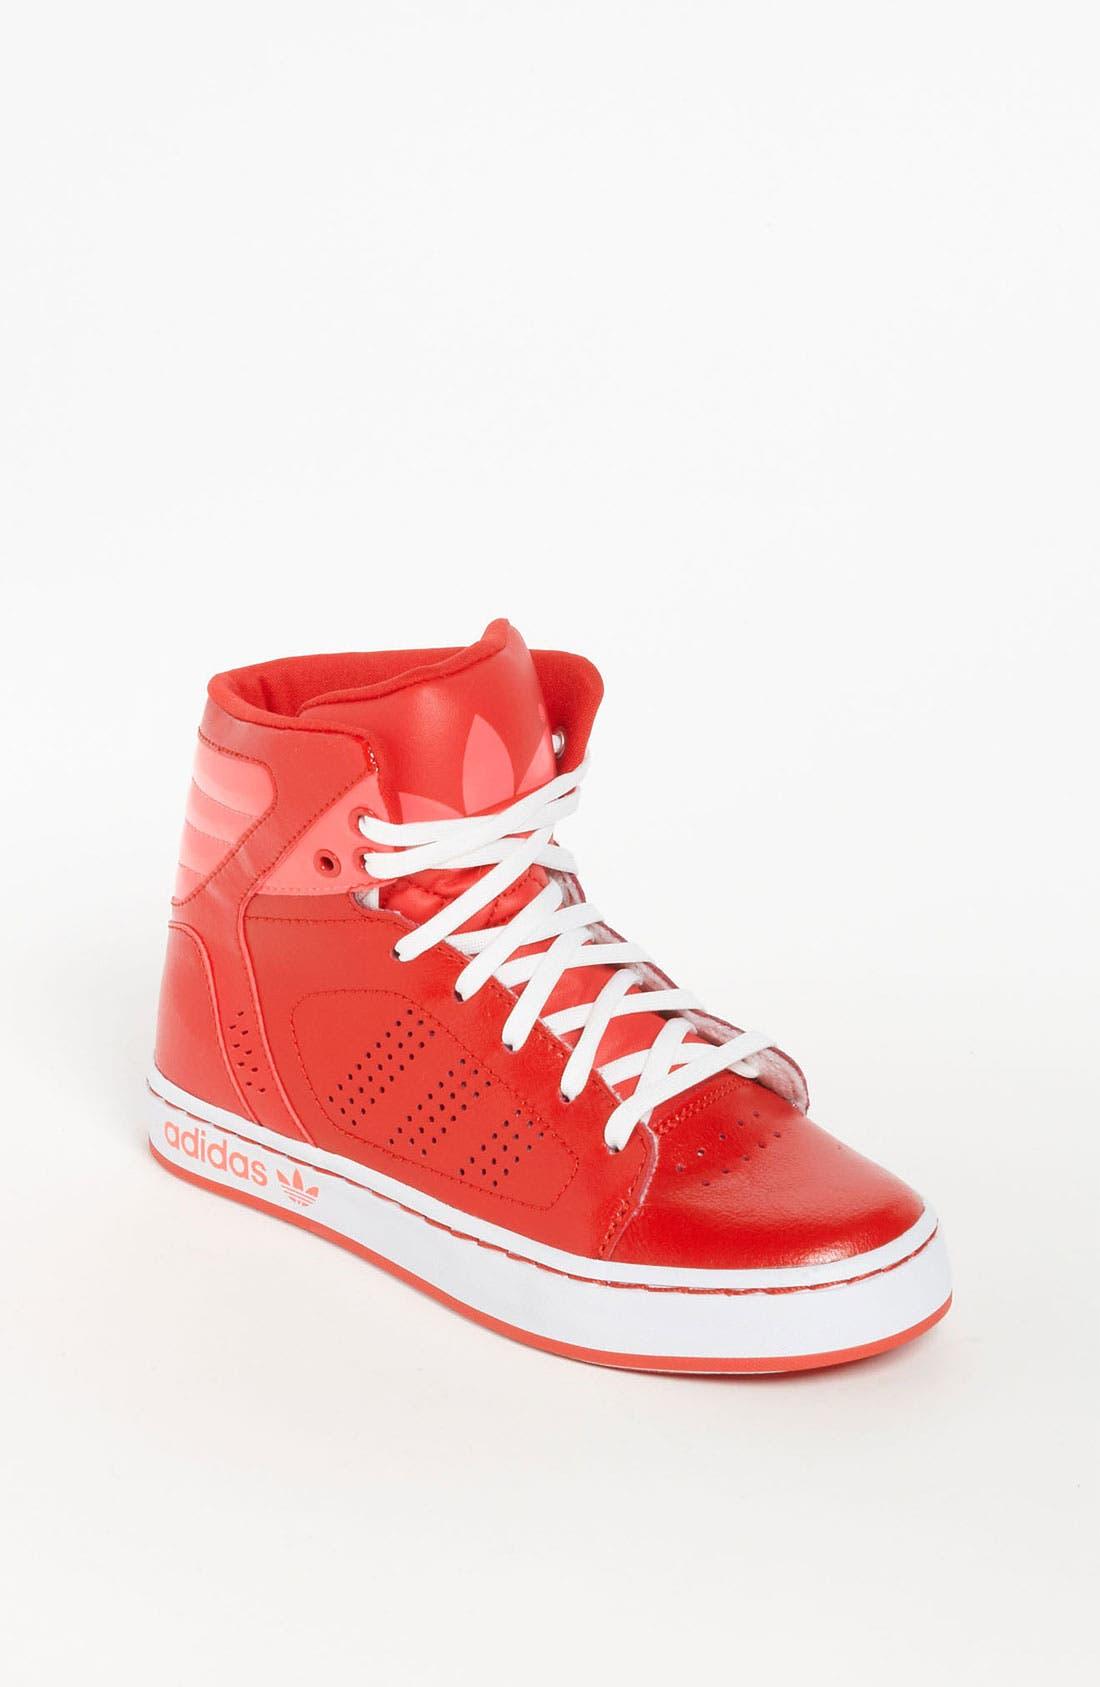 Alternate Image 1 Selected - adidas 'Adi High EXT' Sneaker (Toddler & Little Kid)